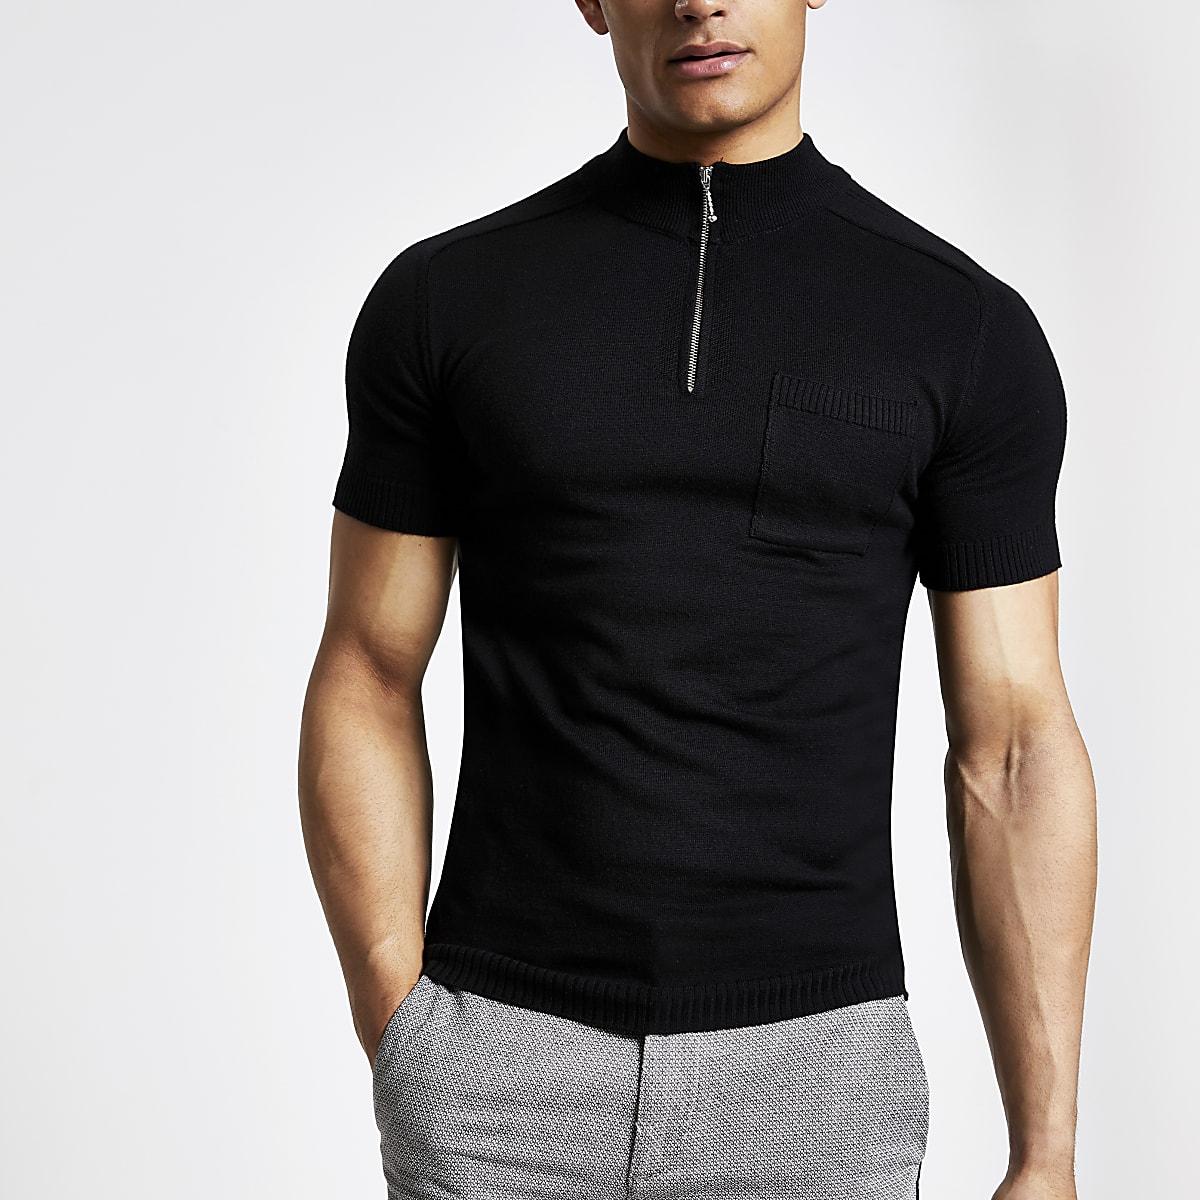 Black muscle fit zip turtle neck T-shirt